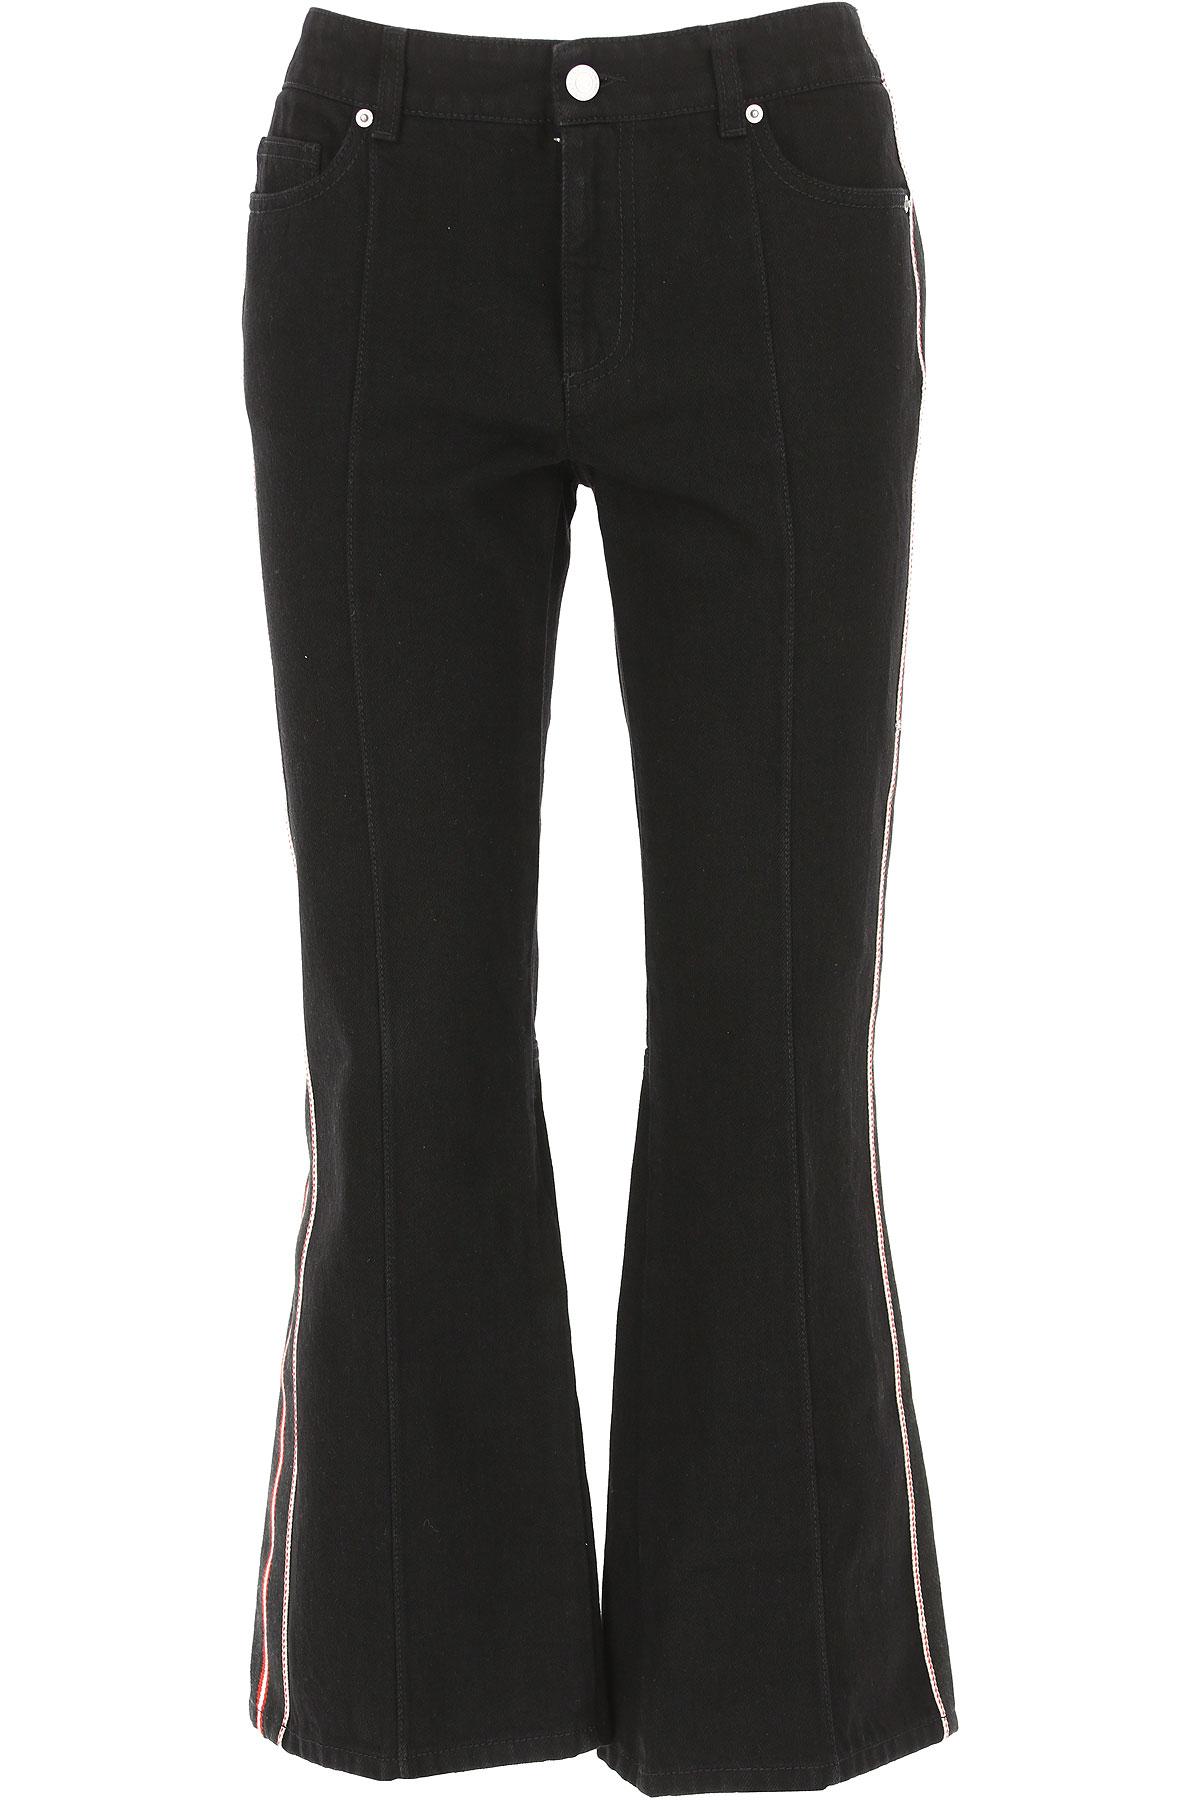 Image of Alexander McQueen Jeans, Black, Cotton, 2017, 26 27 28 29 30